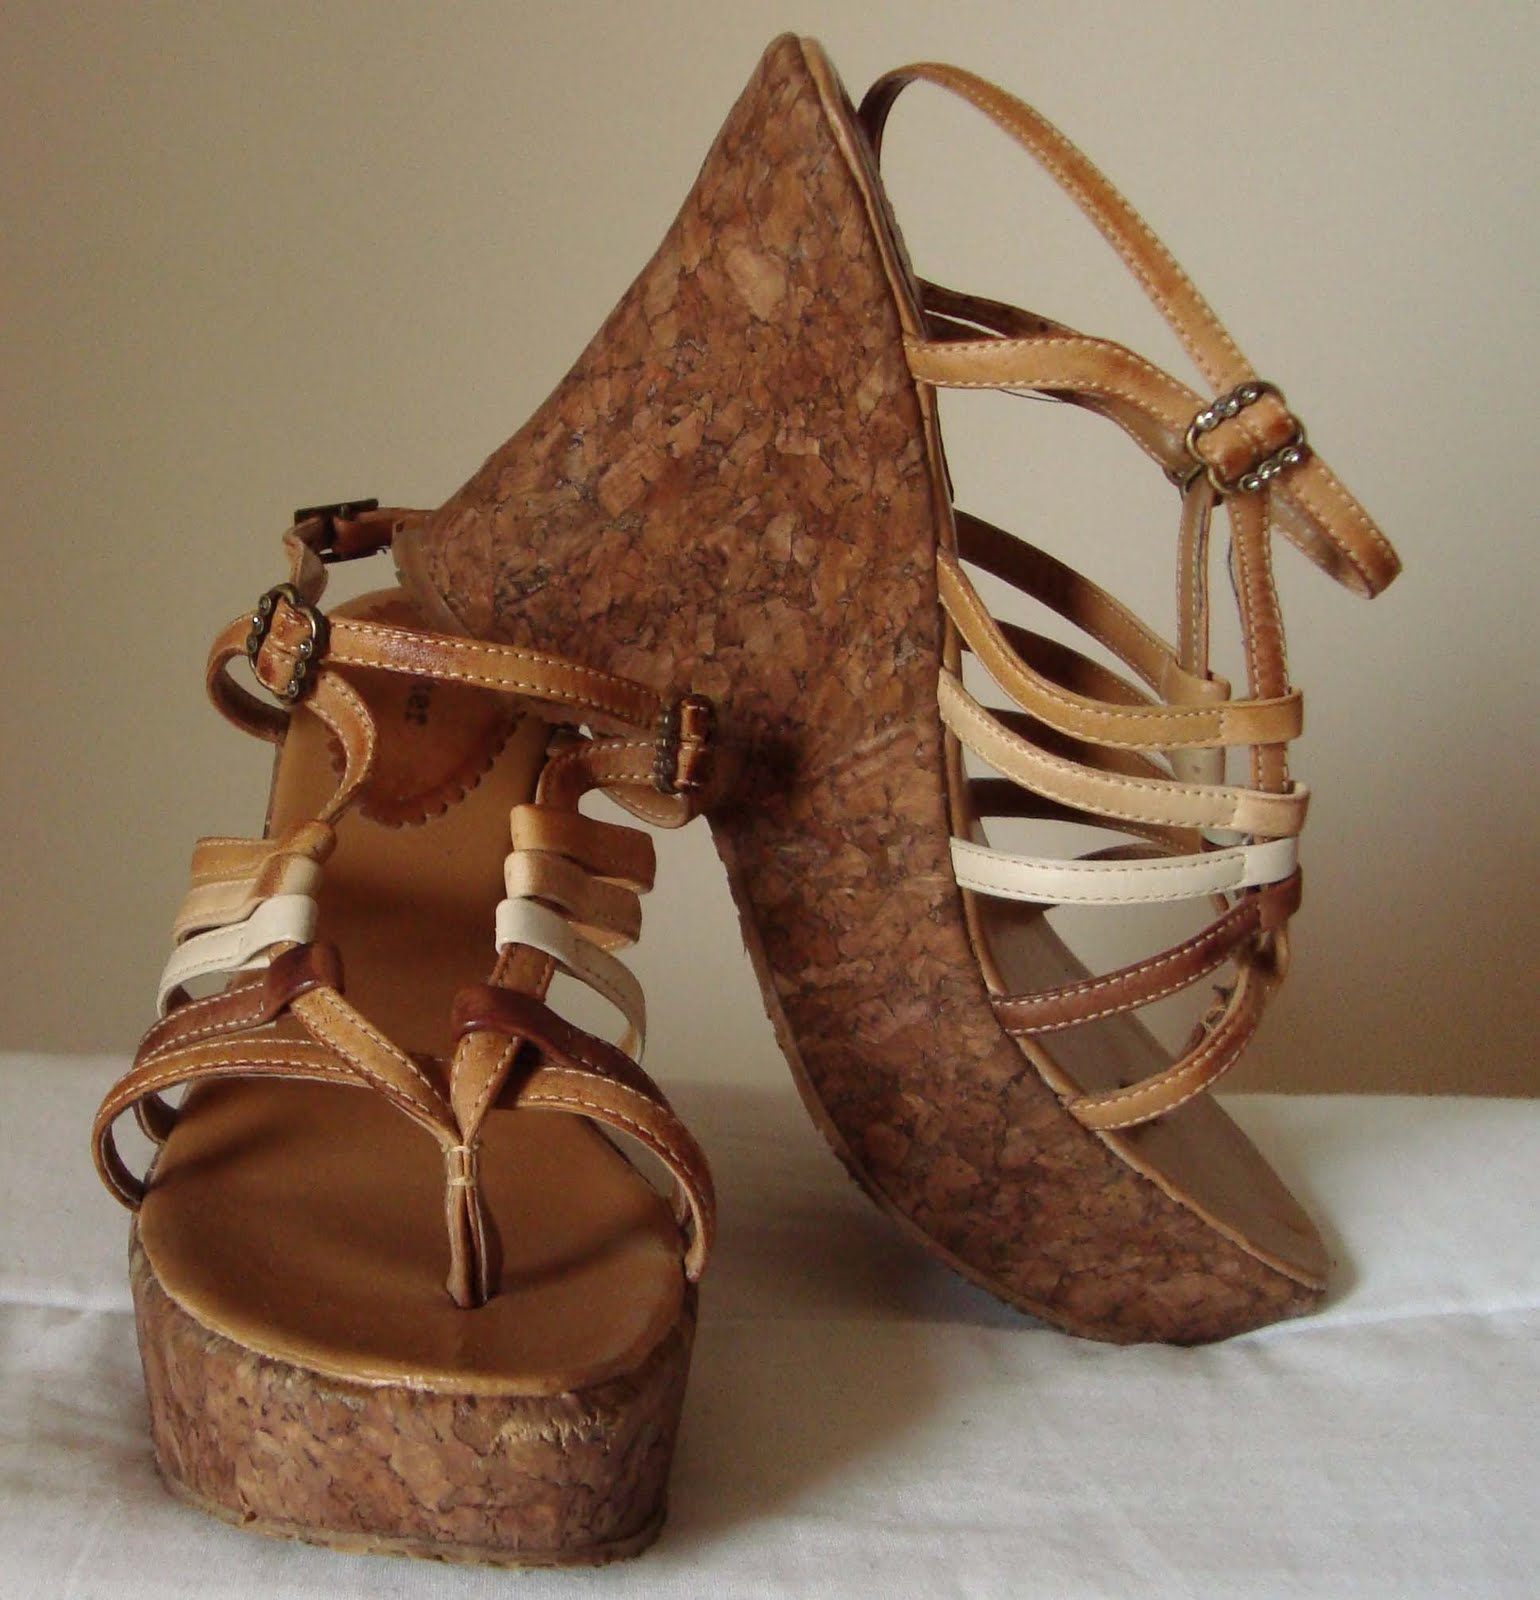 dab857acae We love shoes! Troca de sapatos.  Novembro 2009